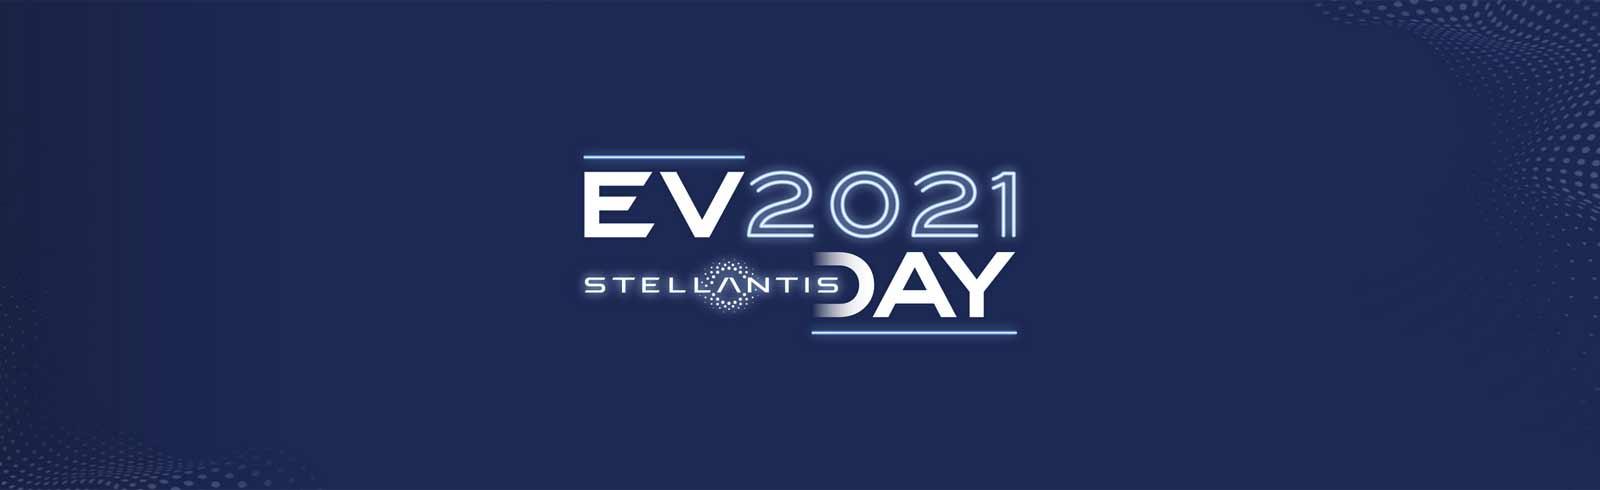 Stellantis intensifies electrification, invests more than €30 billion through 2025